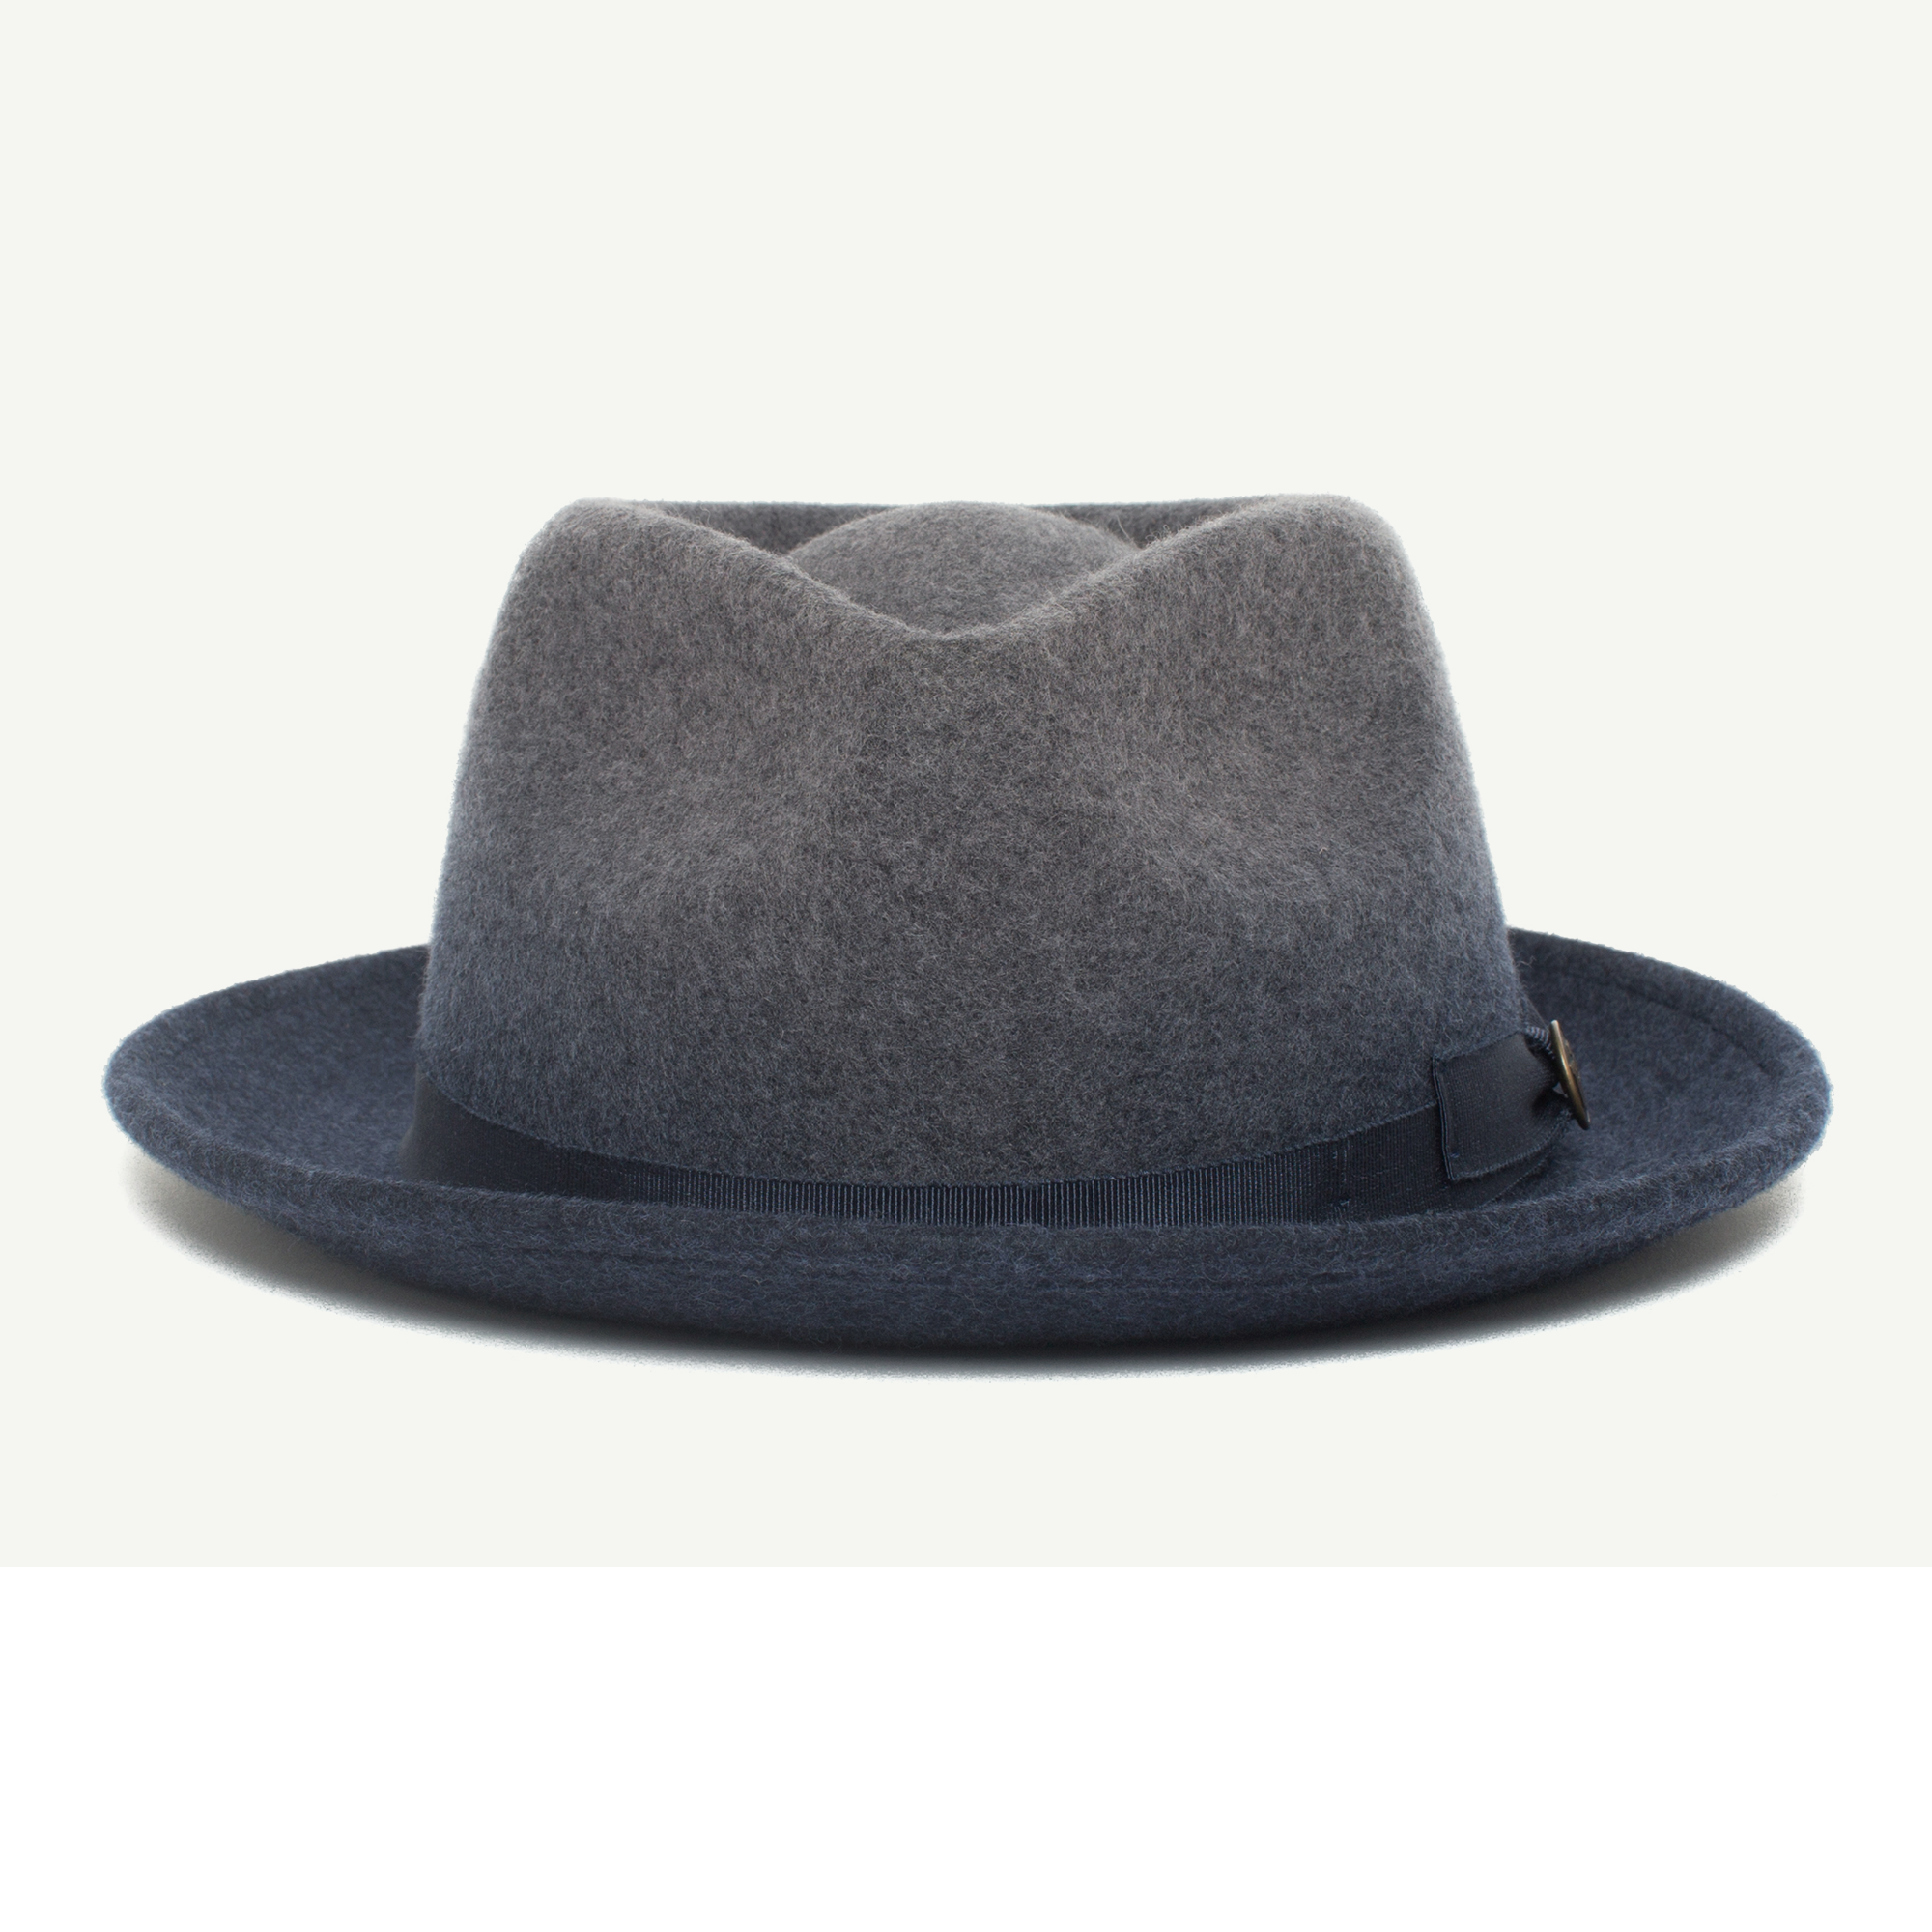 Late Night Felt Fedora Hat  6c186061995f